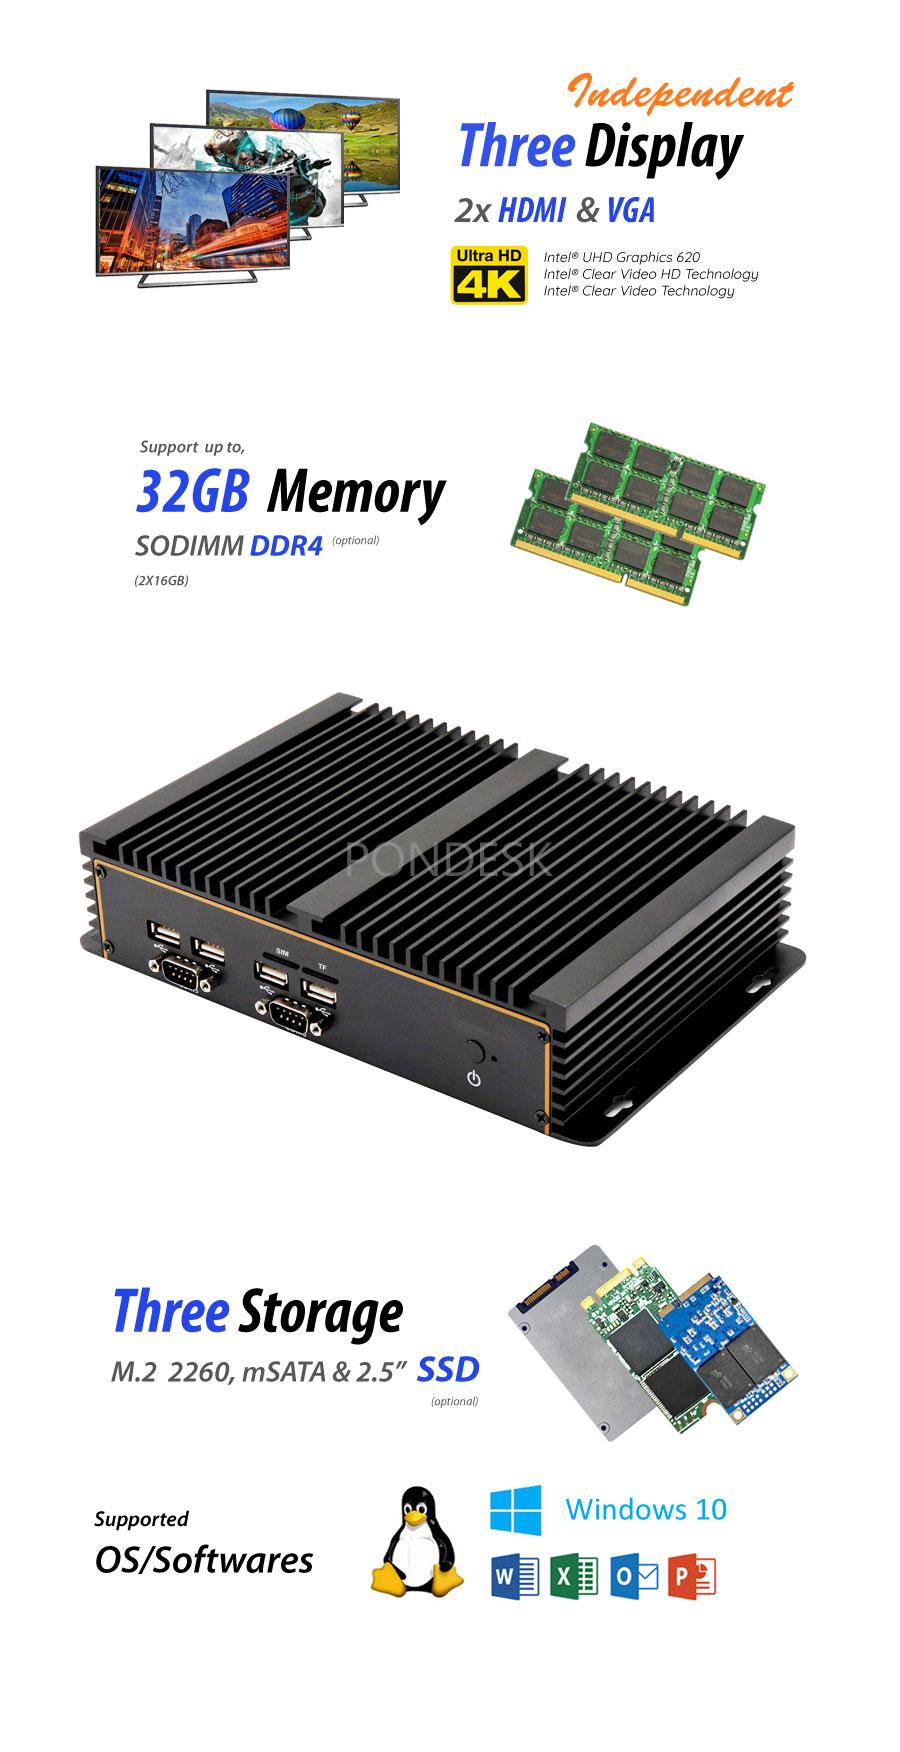 8th Gen Intel® i7 6 COM 3 Display Fanless Industrial Mini PC - MNHO-088 | Image